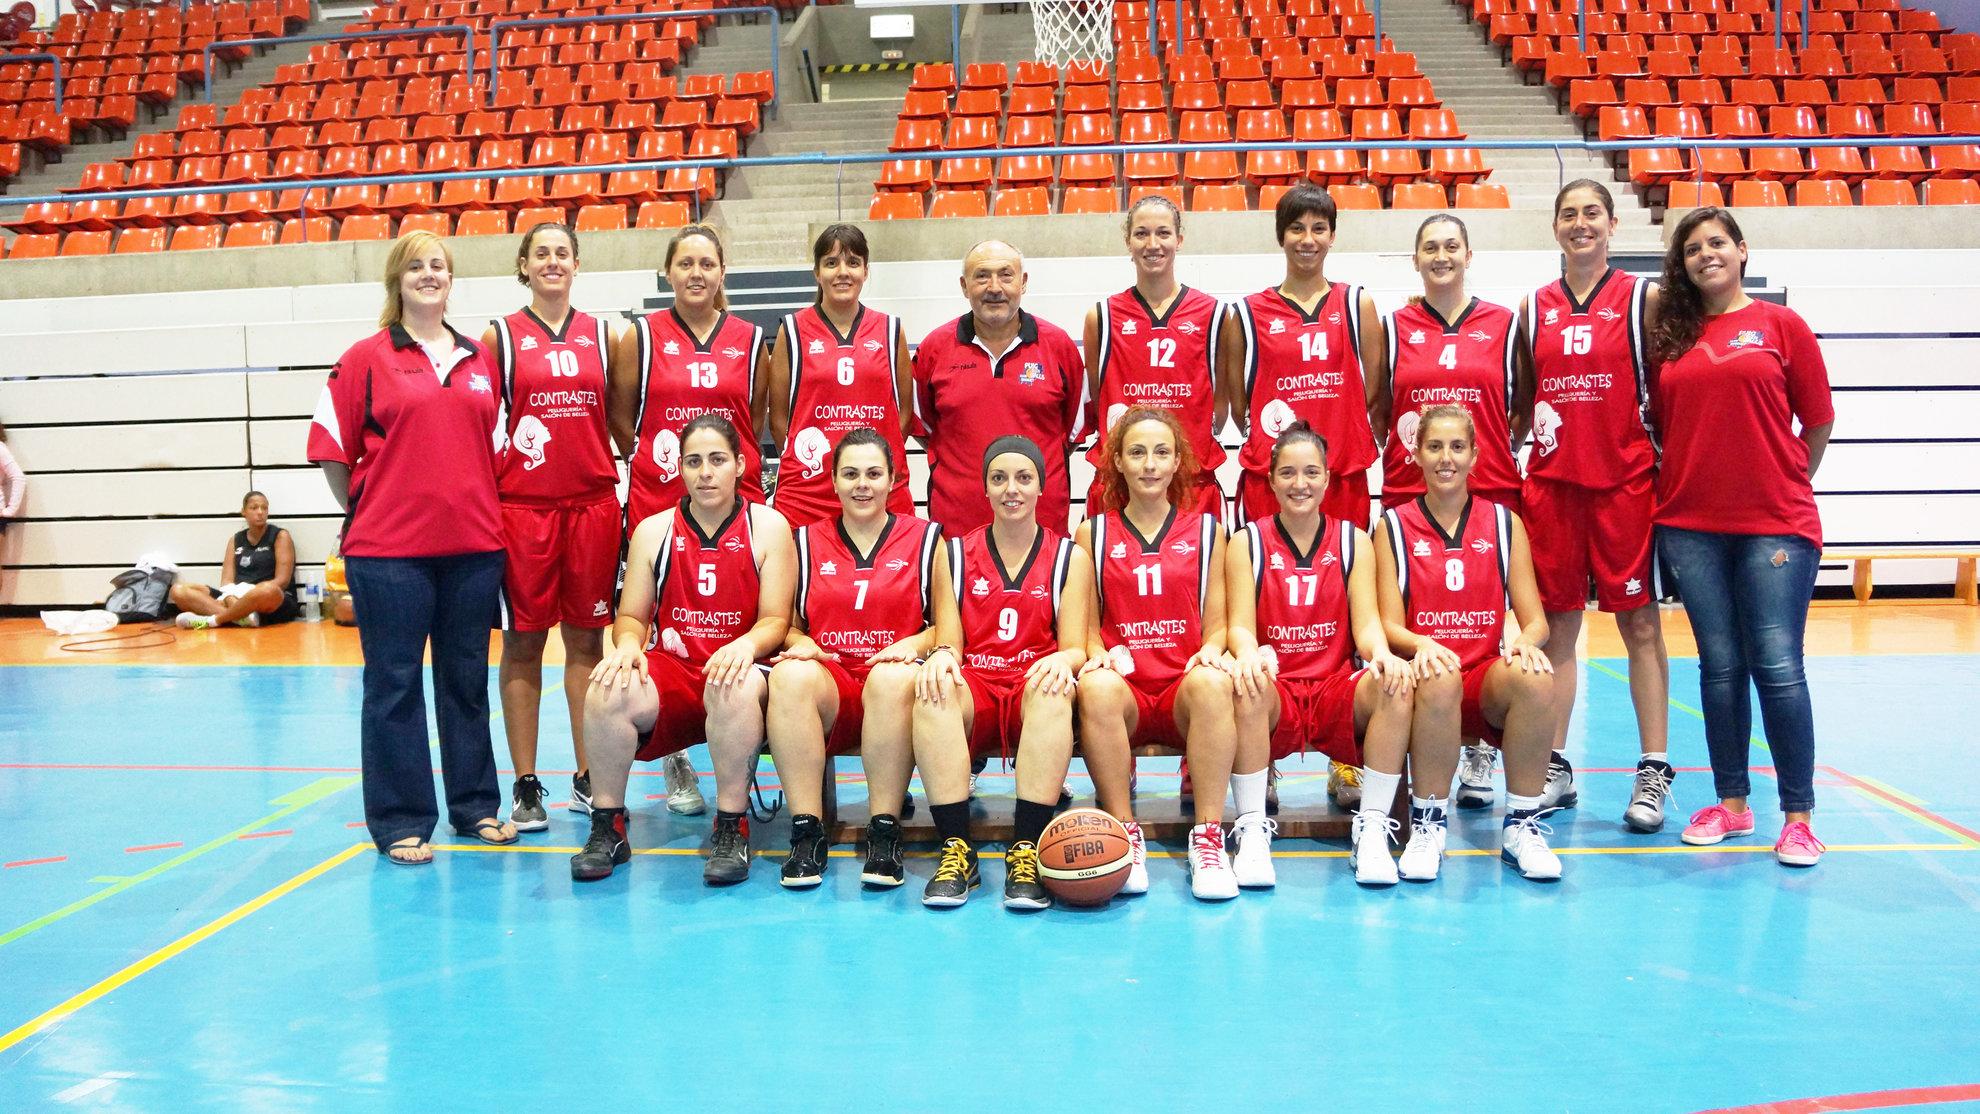 8_senior_femenino_1_division_pdv_portus_frufor